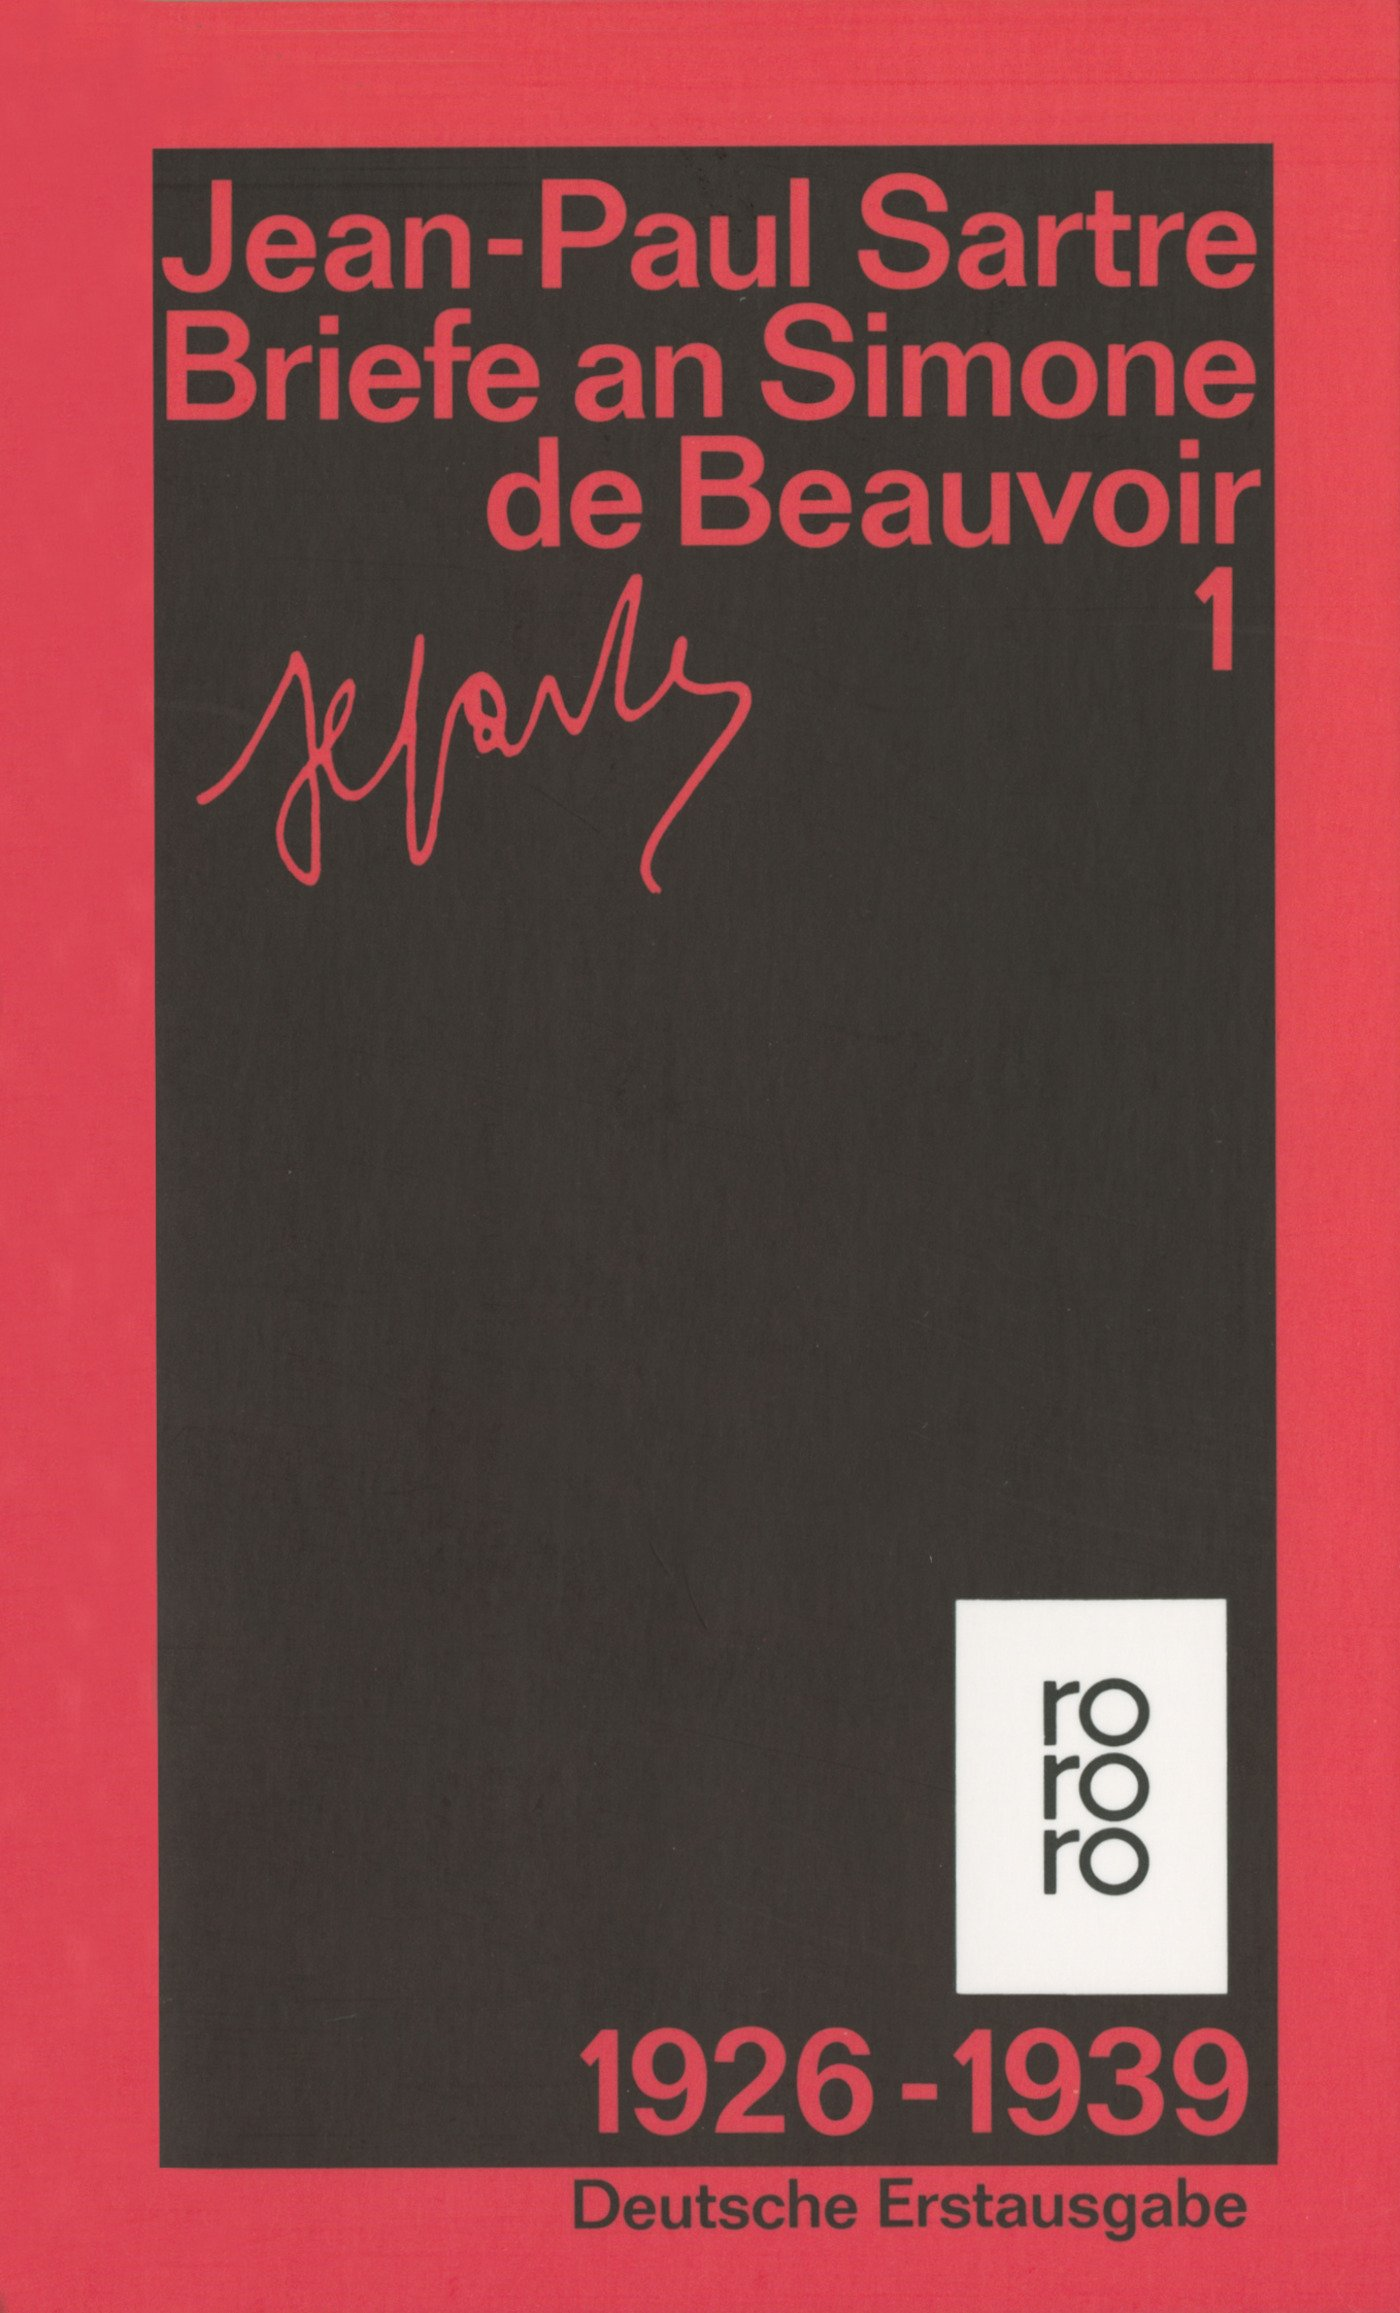 briefe-an-simone-de-beauvoir-1926-1939